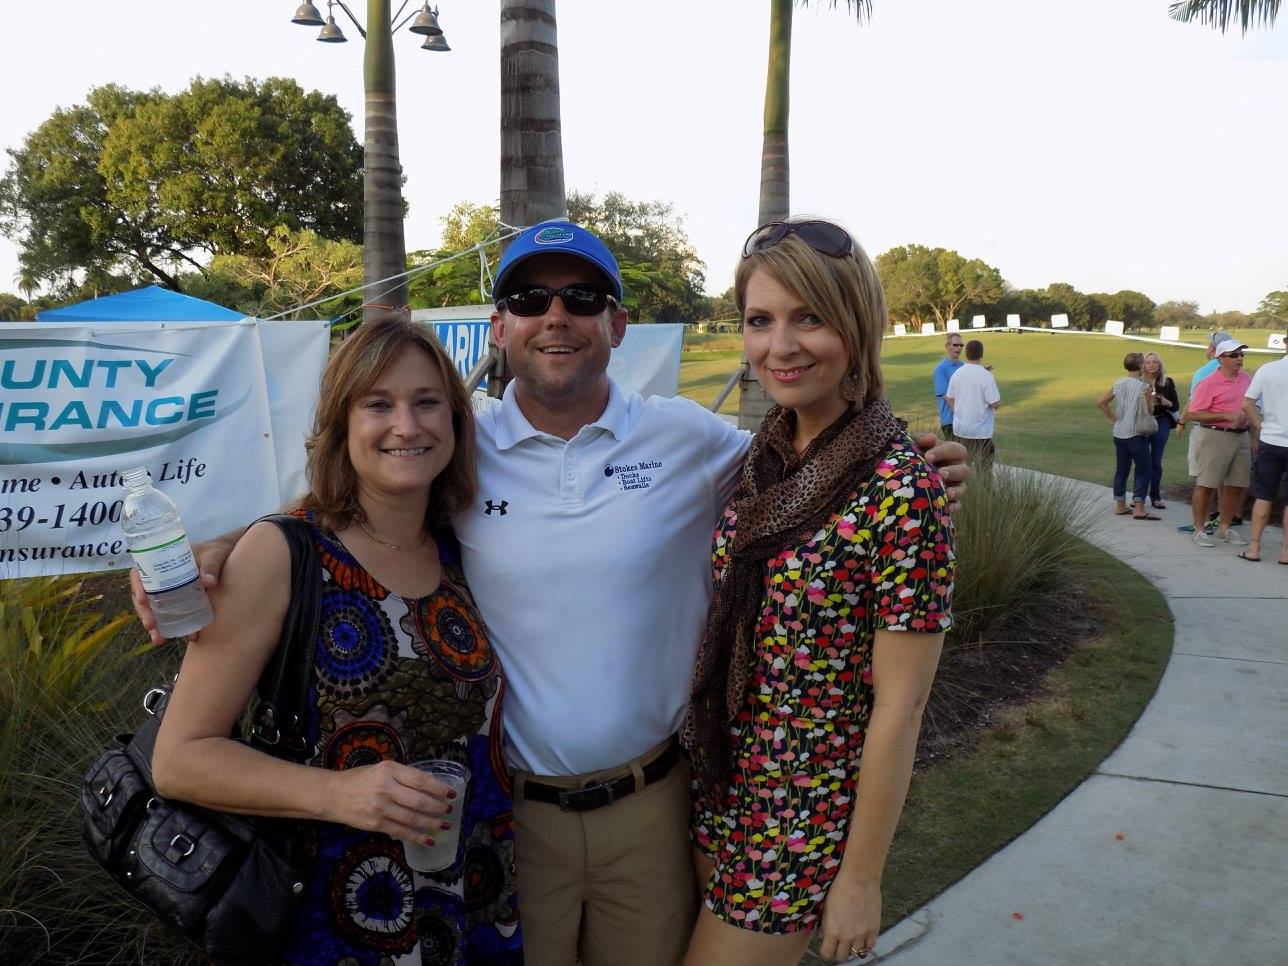 Michele Hoover, Brent Stokes, and Erica Castner